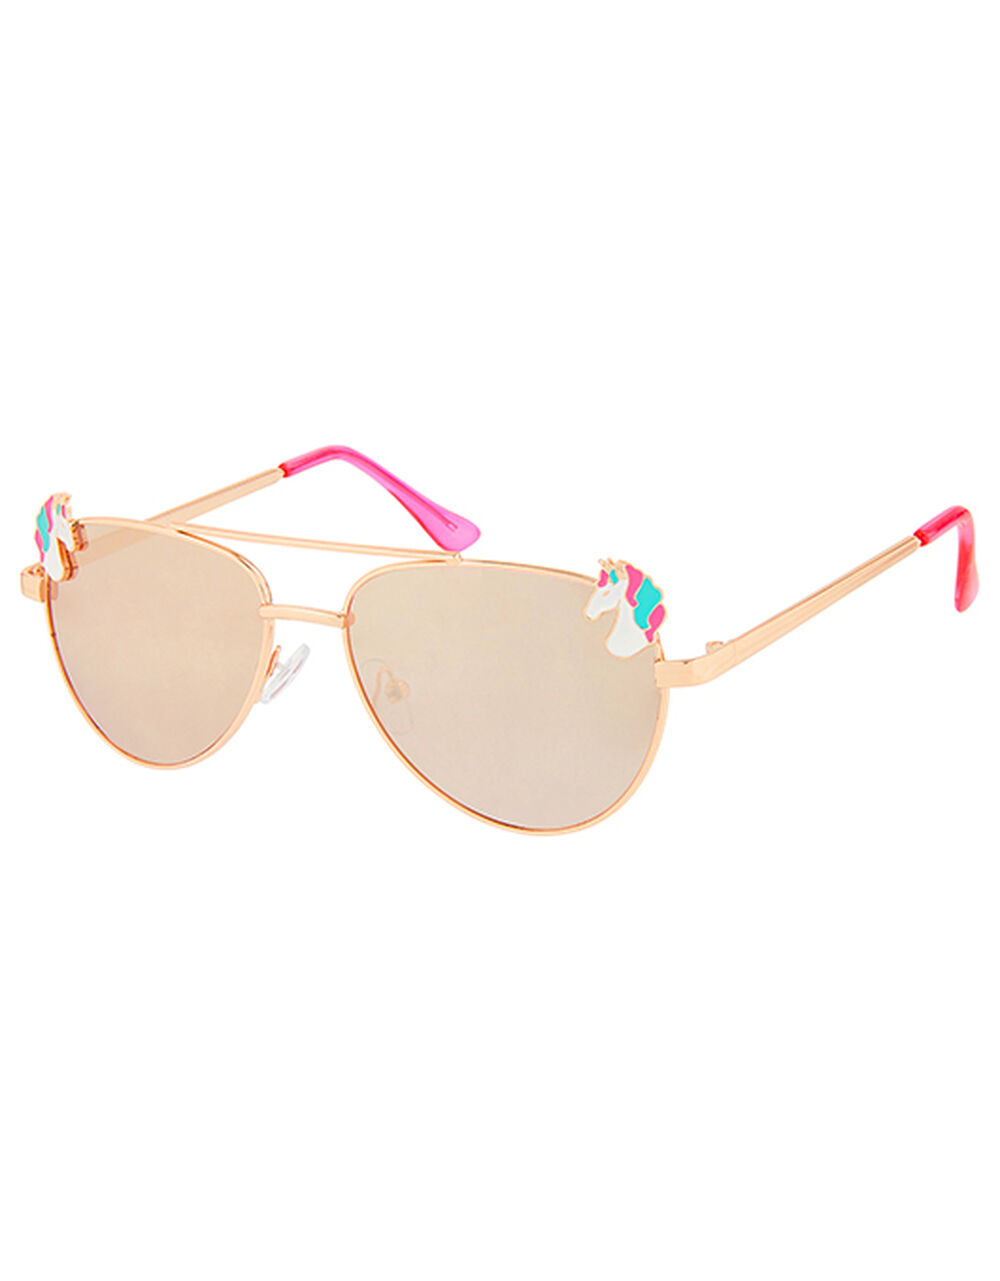 Unicorn Aviator Sunglasses, , large